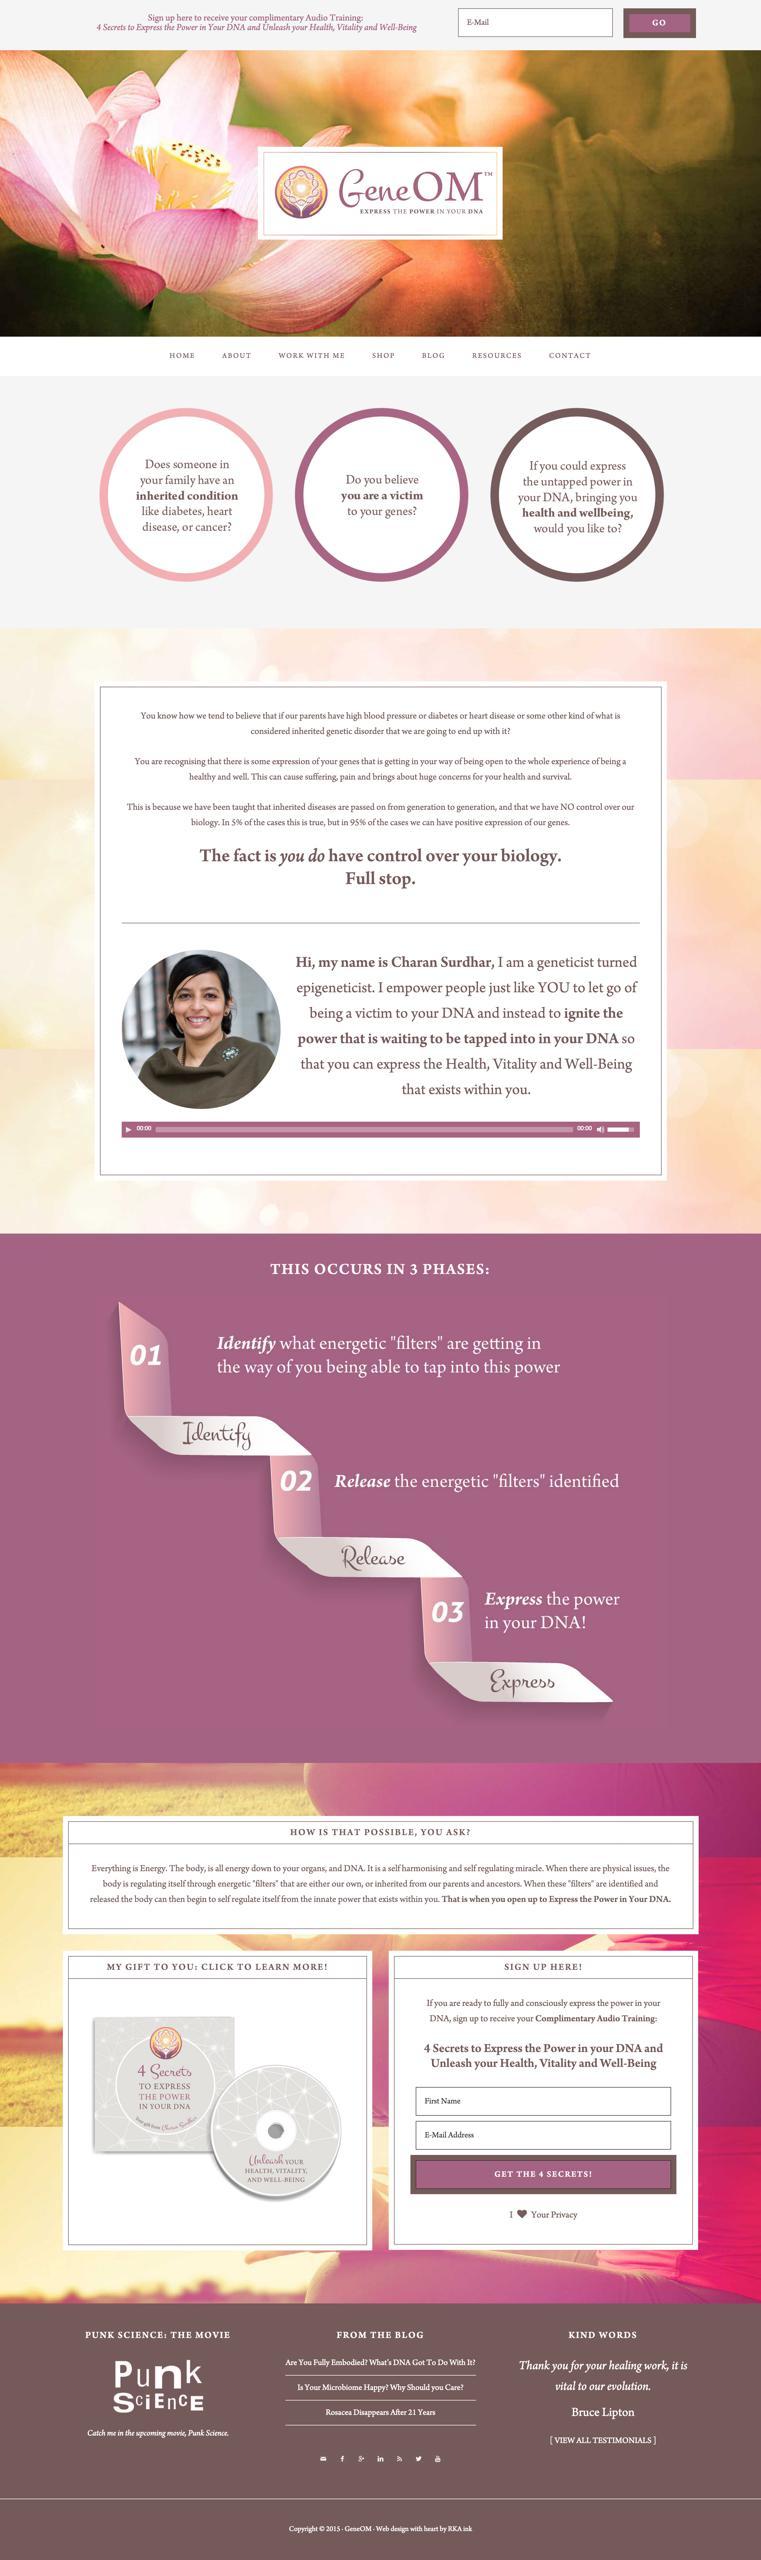 GeneOM Custom WordPress Web Design RKA ink